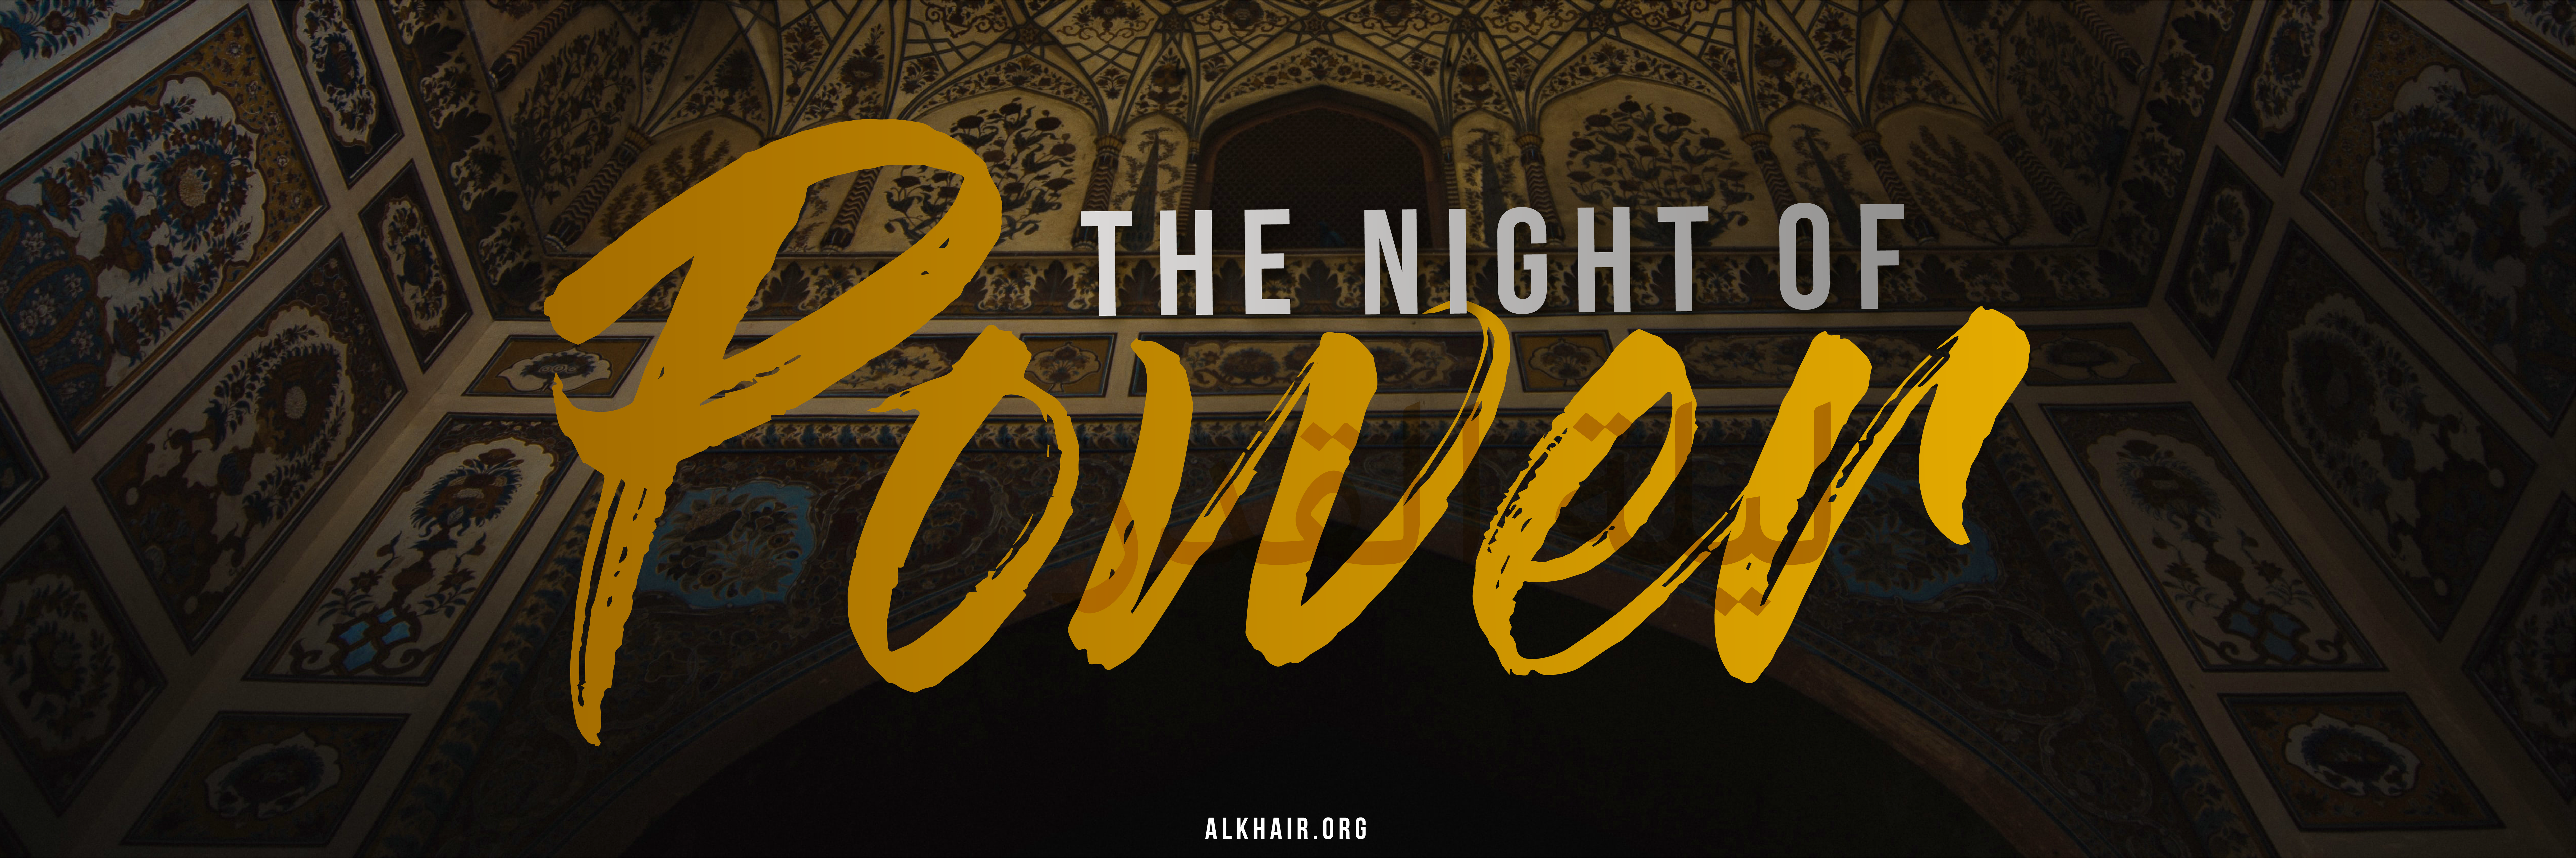 f_the_night_of_power_2020_al_khair_foundation_sulzart-02